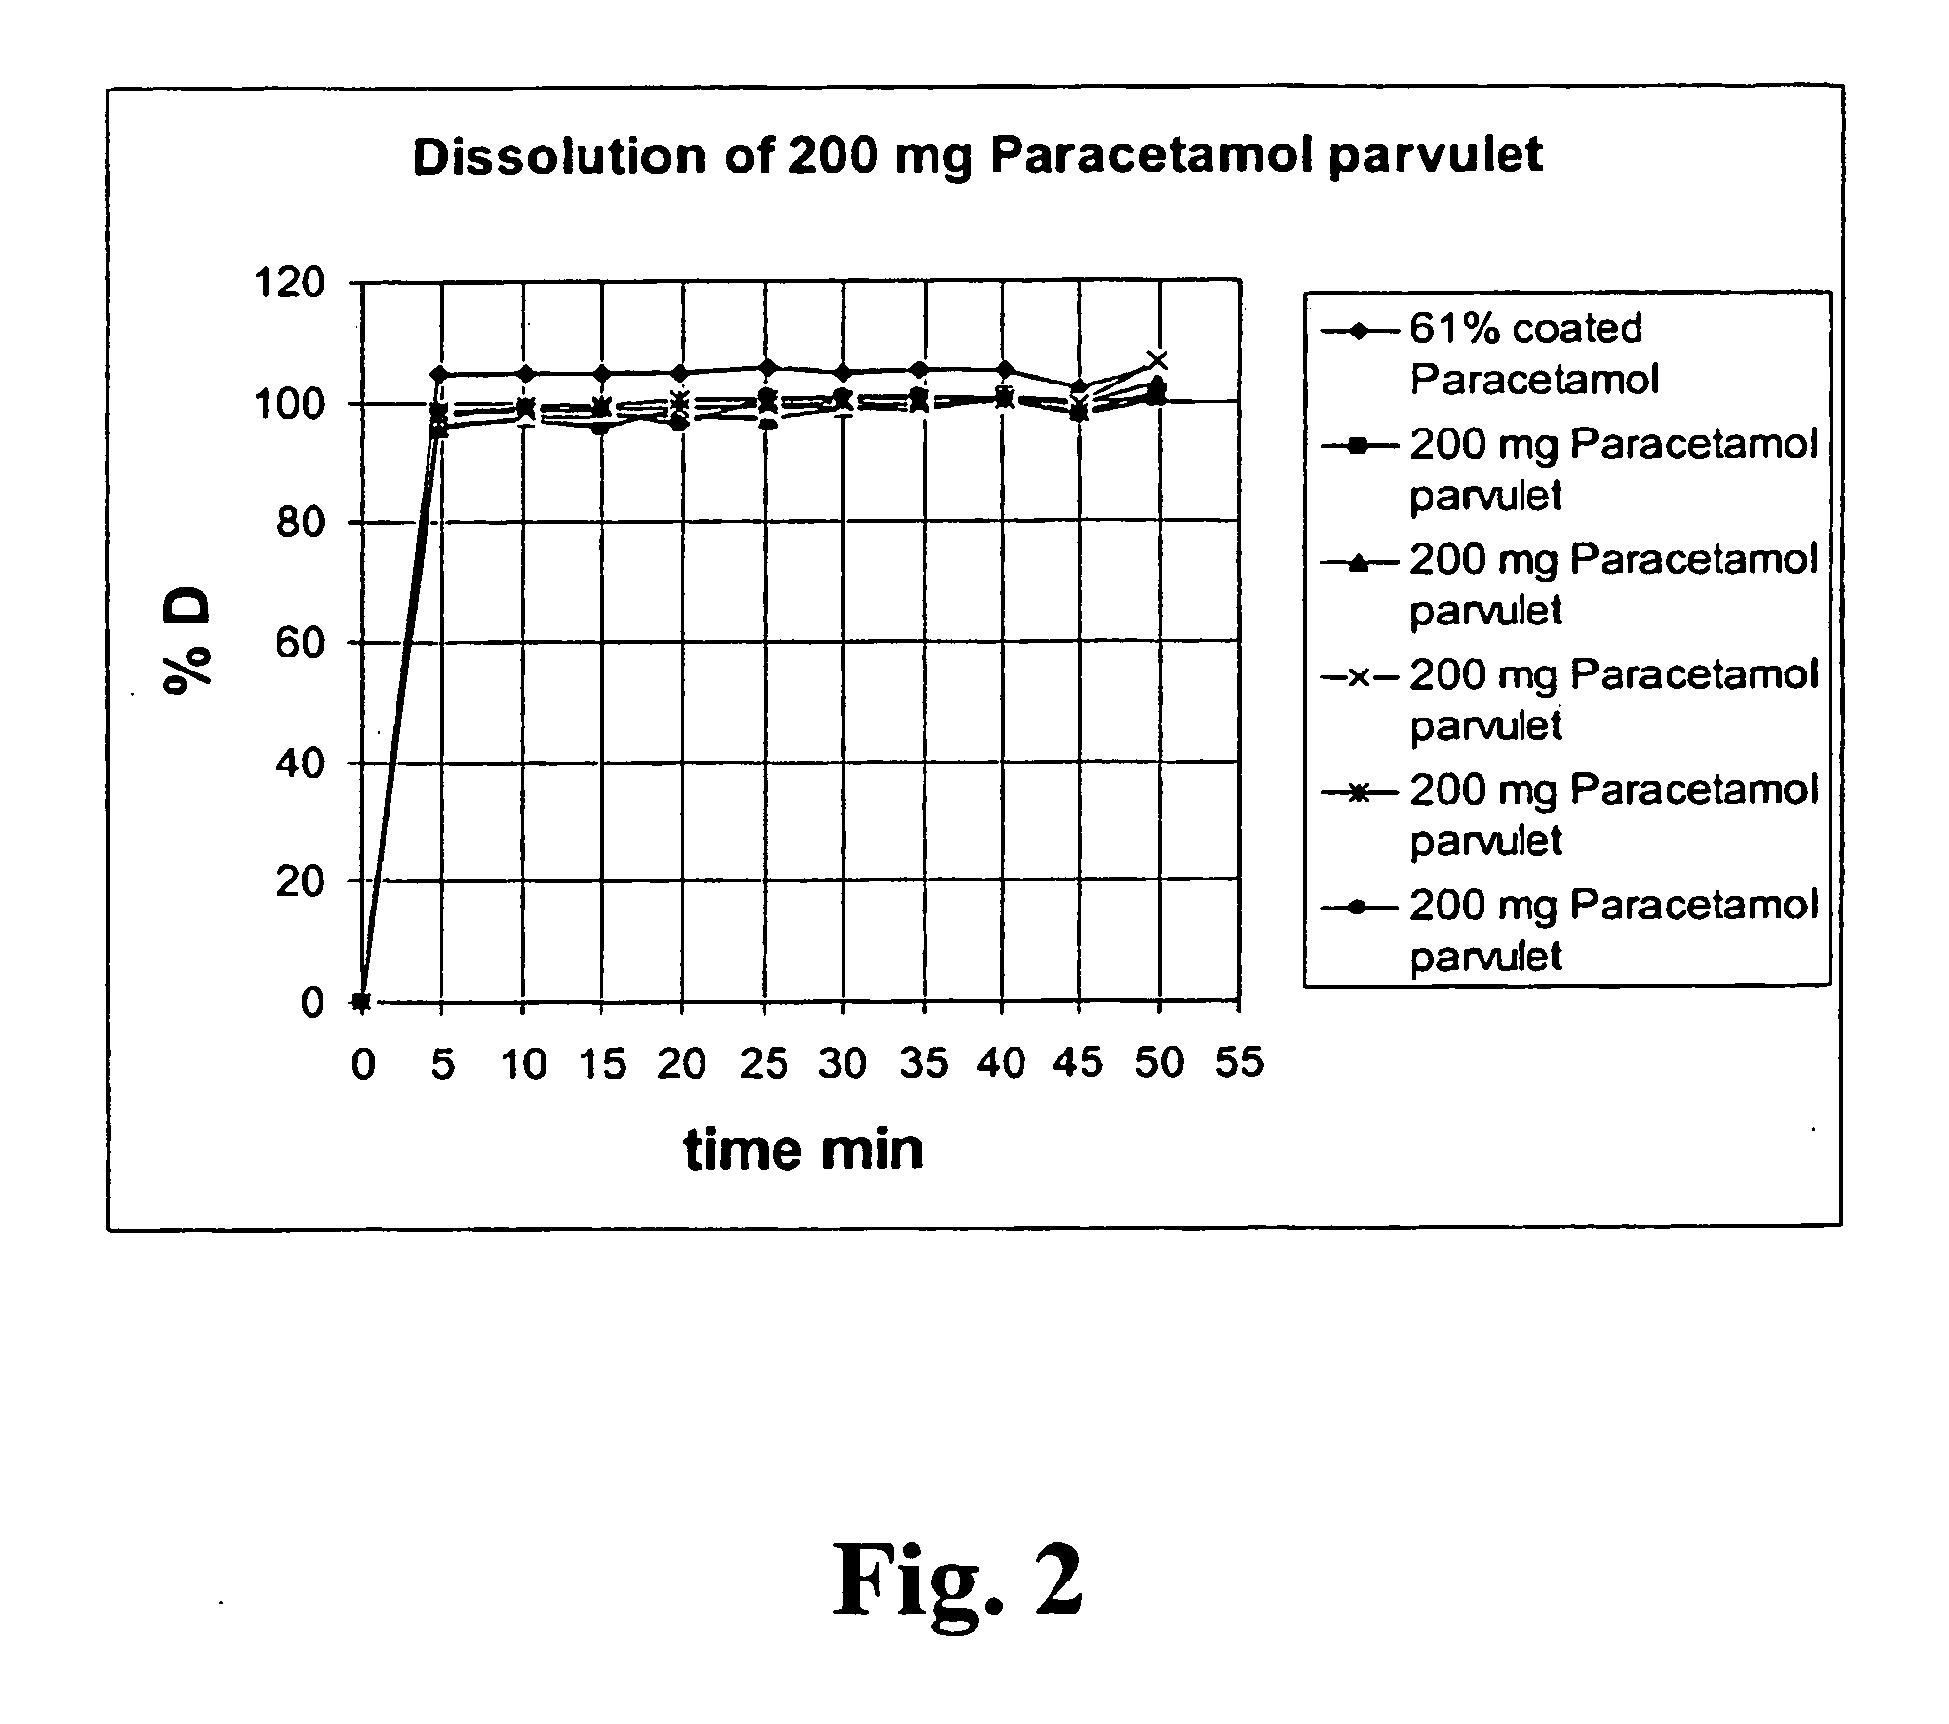 SWELLABLE DOSAGE FORM COMPRISING GELLAN GUM - Patent 1758557